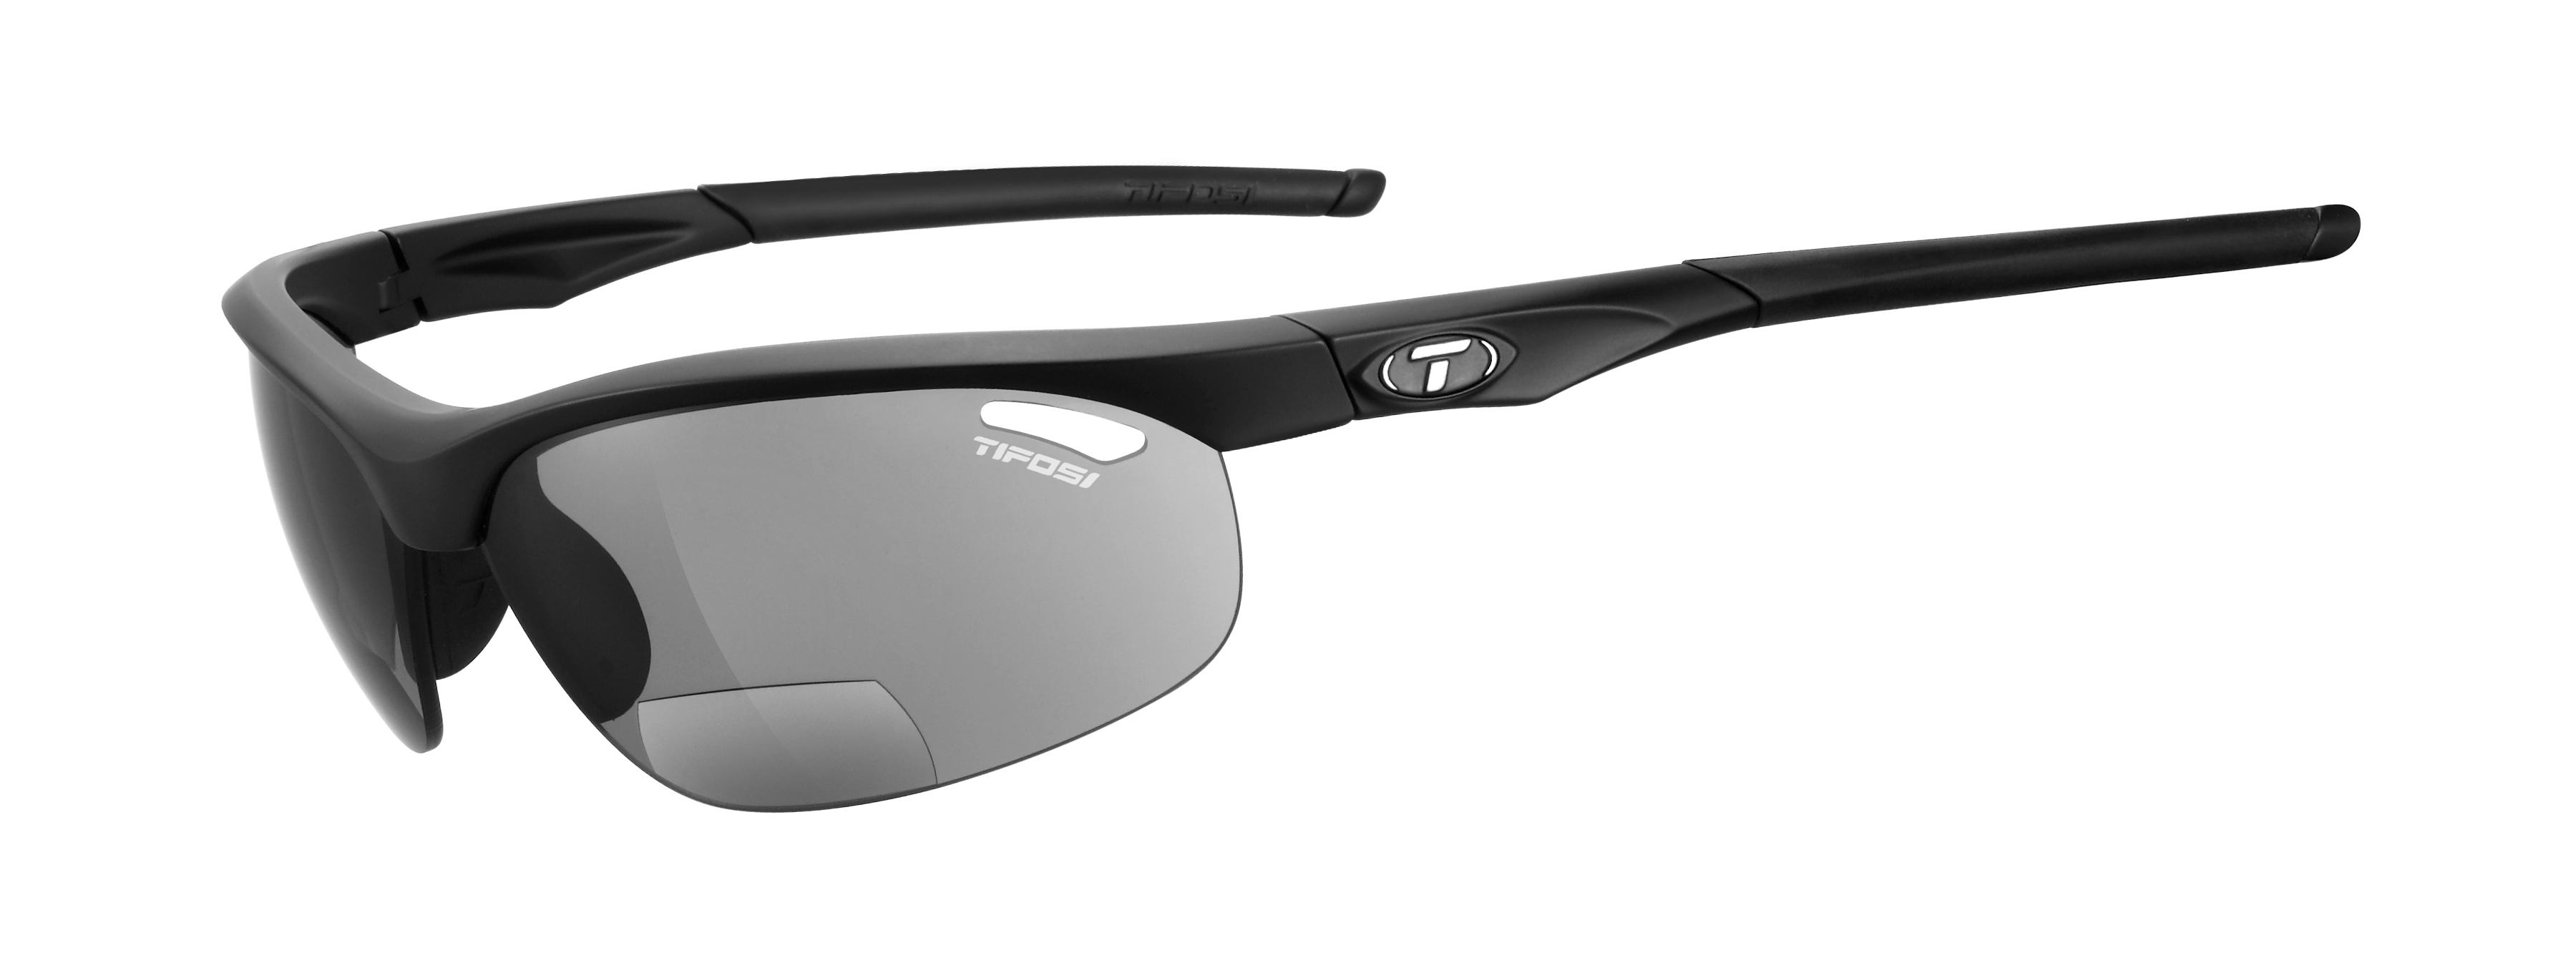 Pedalatleten Tifosi Veloce Matt Black Smoke Reader +2.5 Cykeltøj  Solbriller